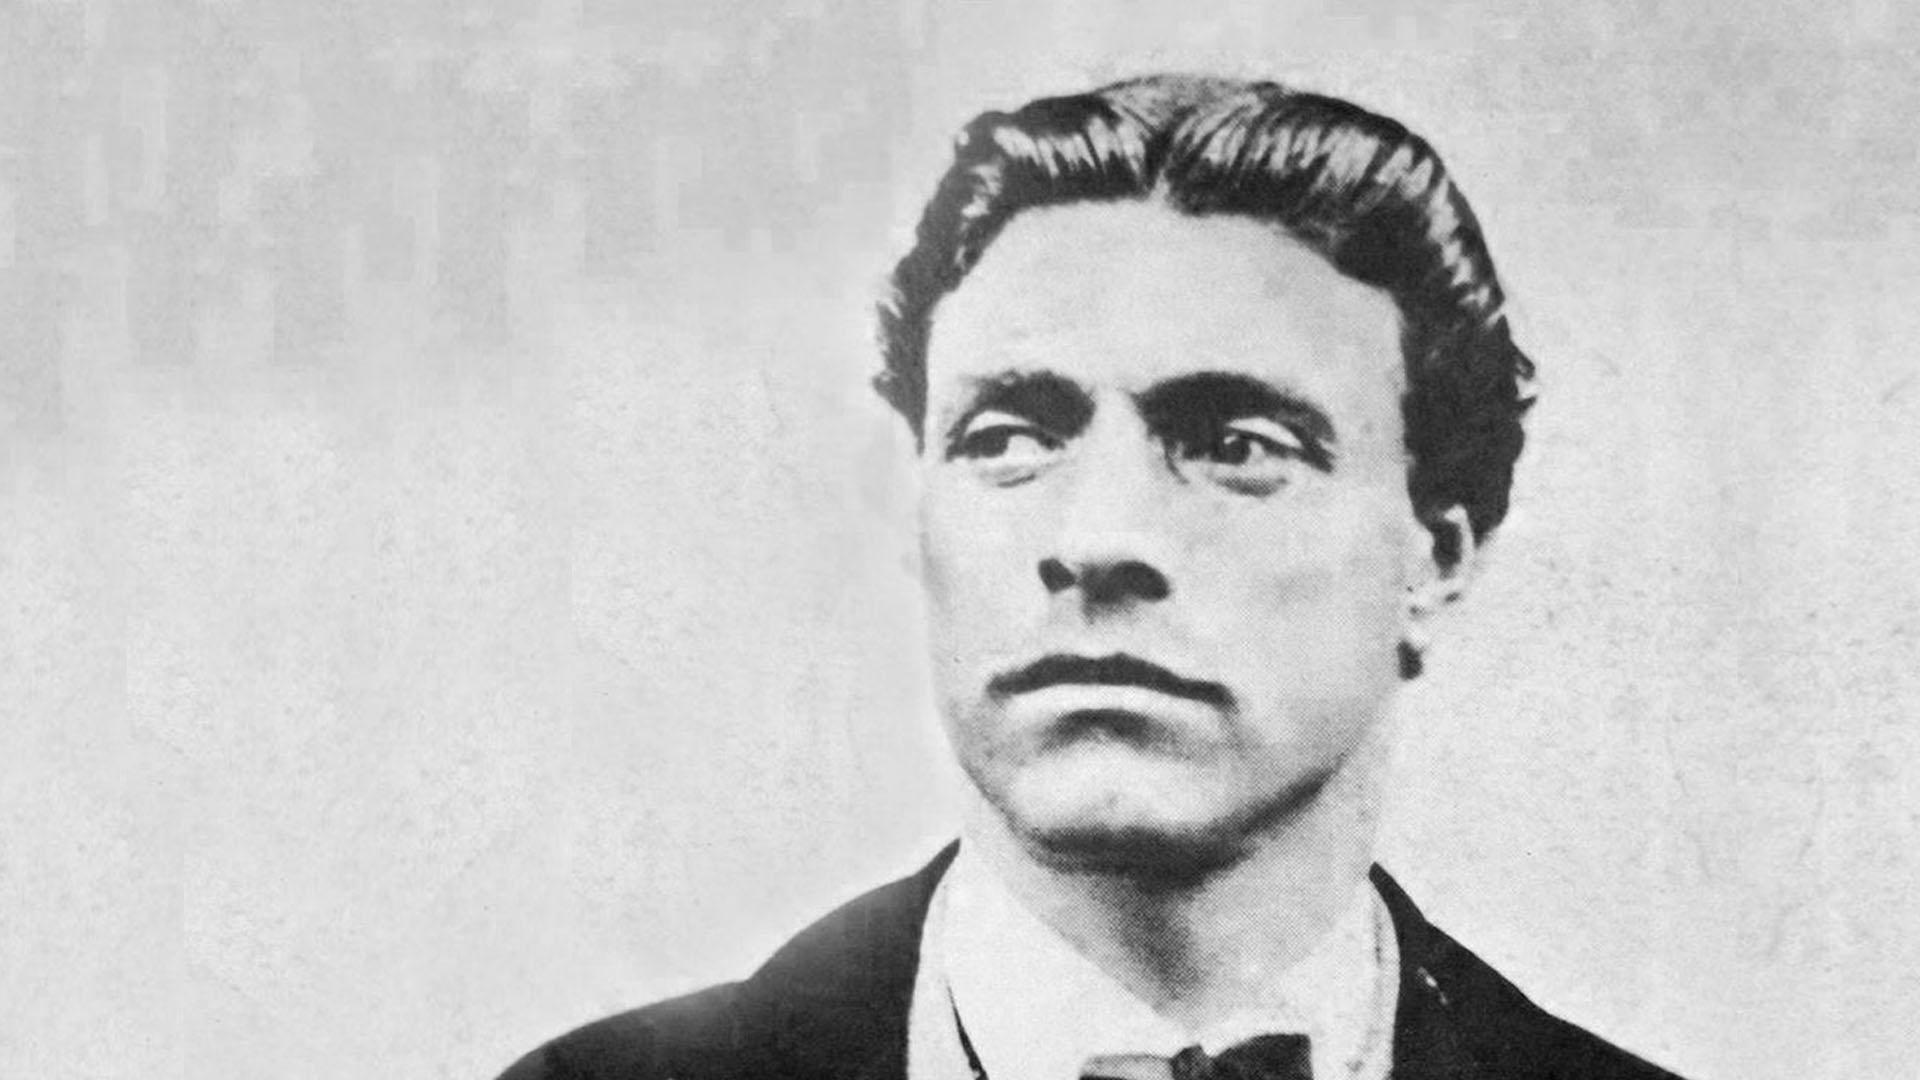 18 юли: Васил Левски